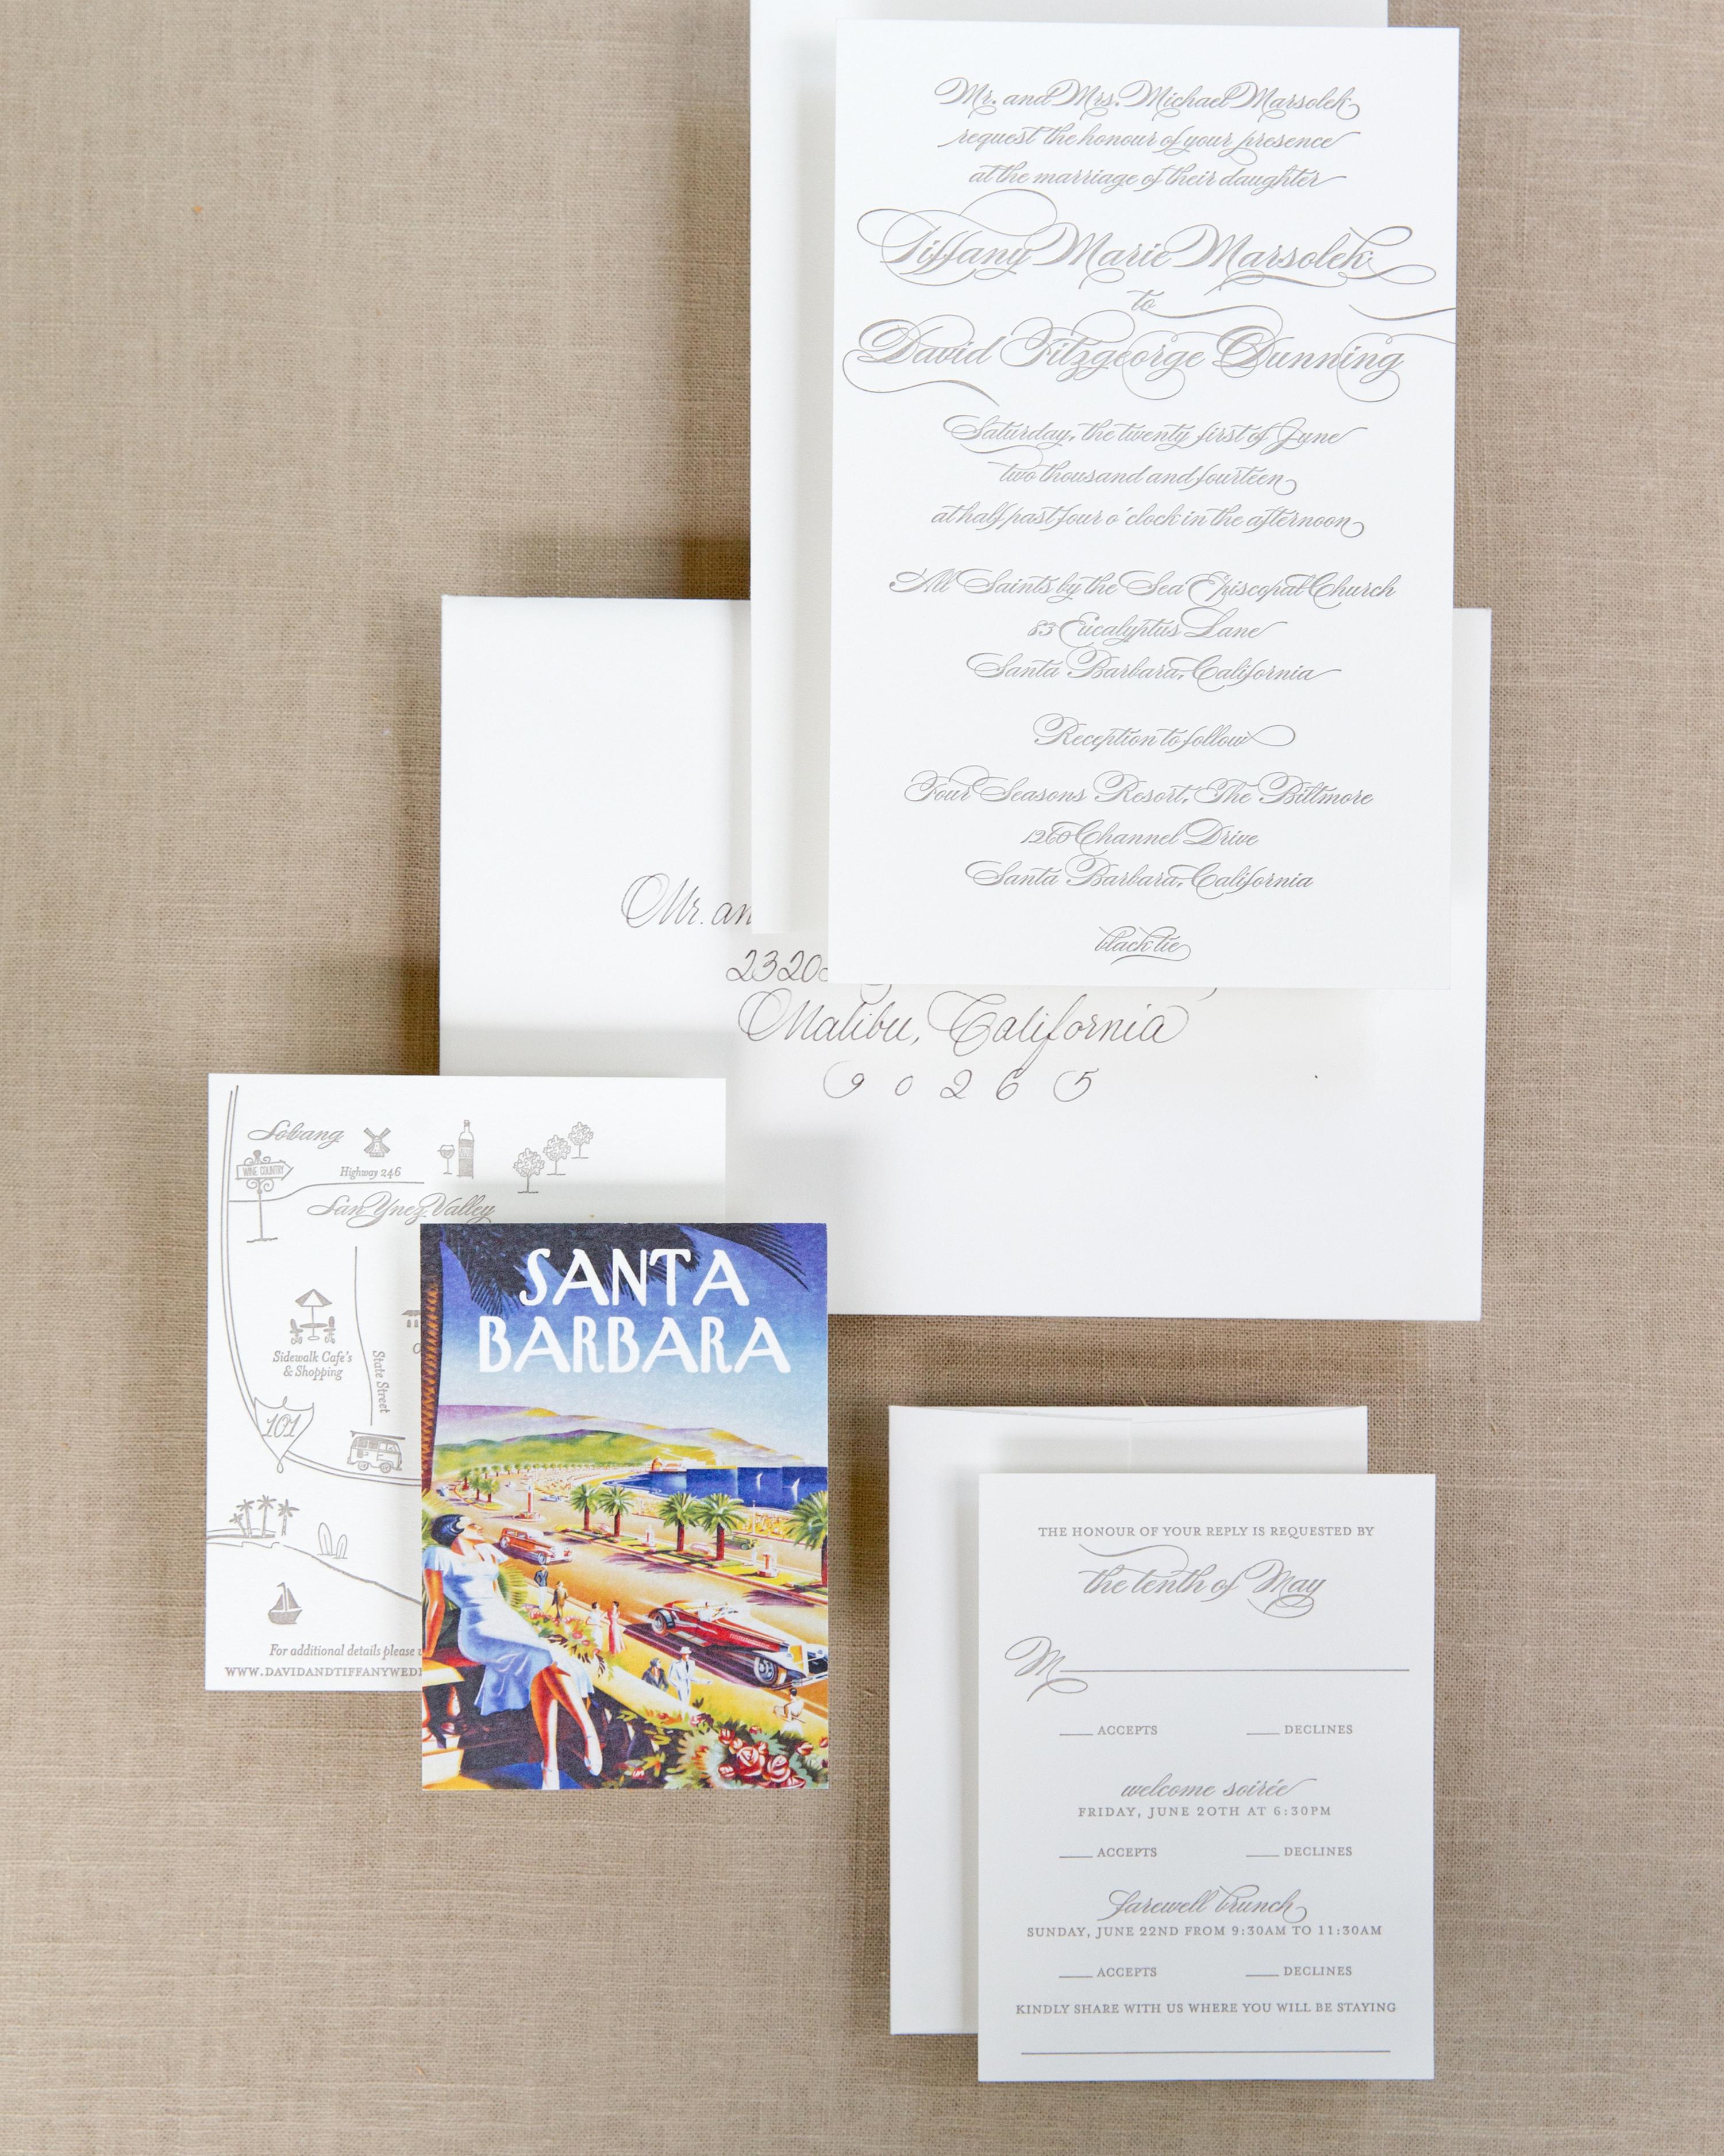 tiffany-david-wedding-invite-6-s112676-1115.jpg